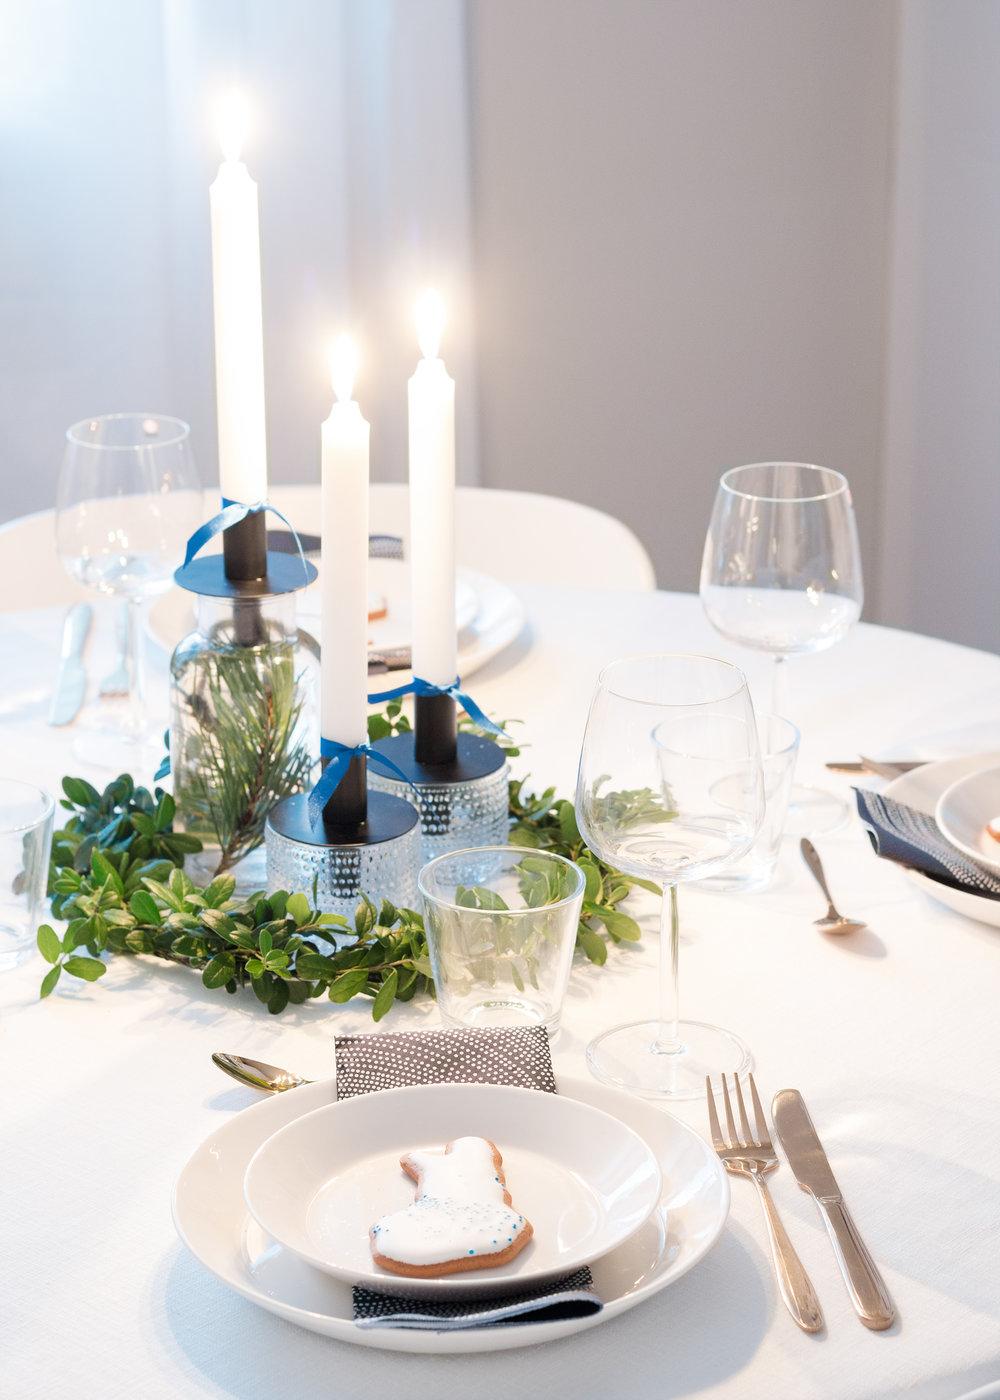 Finland 100 | Table setting | Suomi 100 kattaus | Sandramarias.com | Lifestyle By Sandramaria